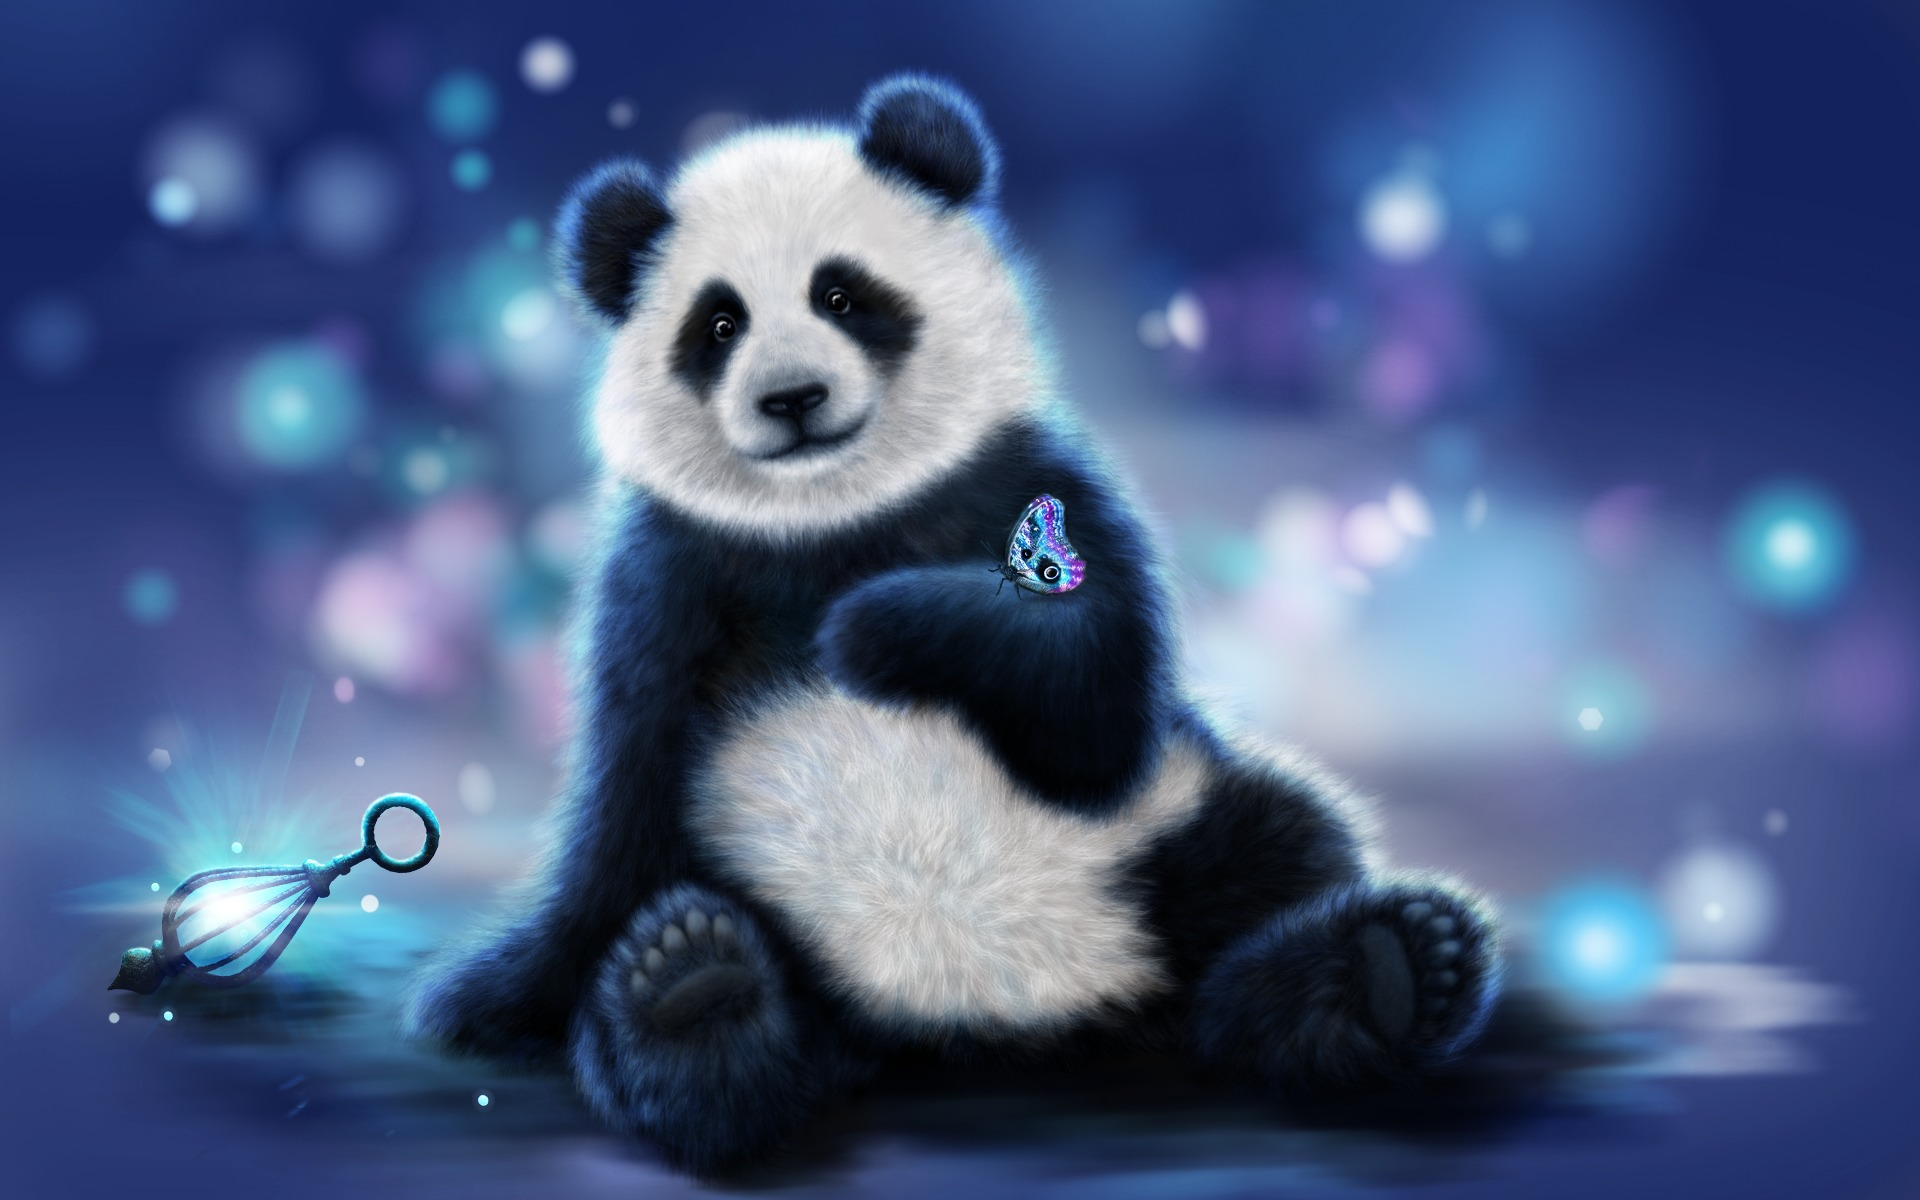 45 Cute Pandas Wallpaper On Wallpapersafari